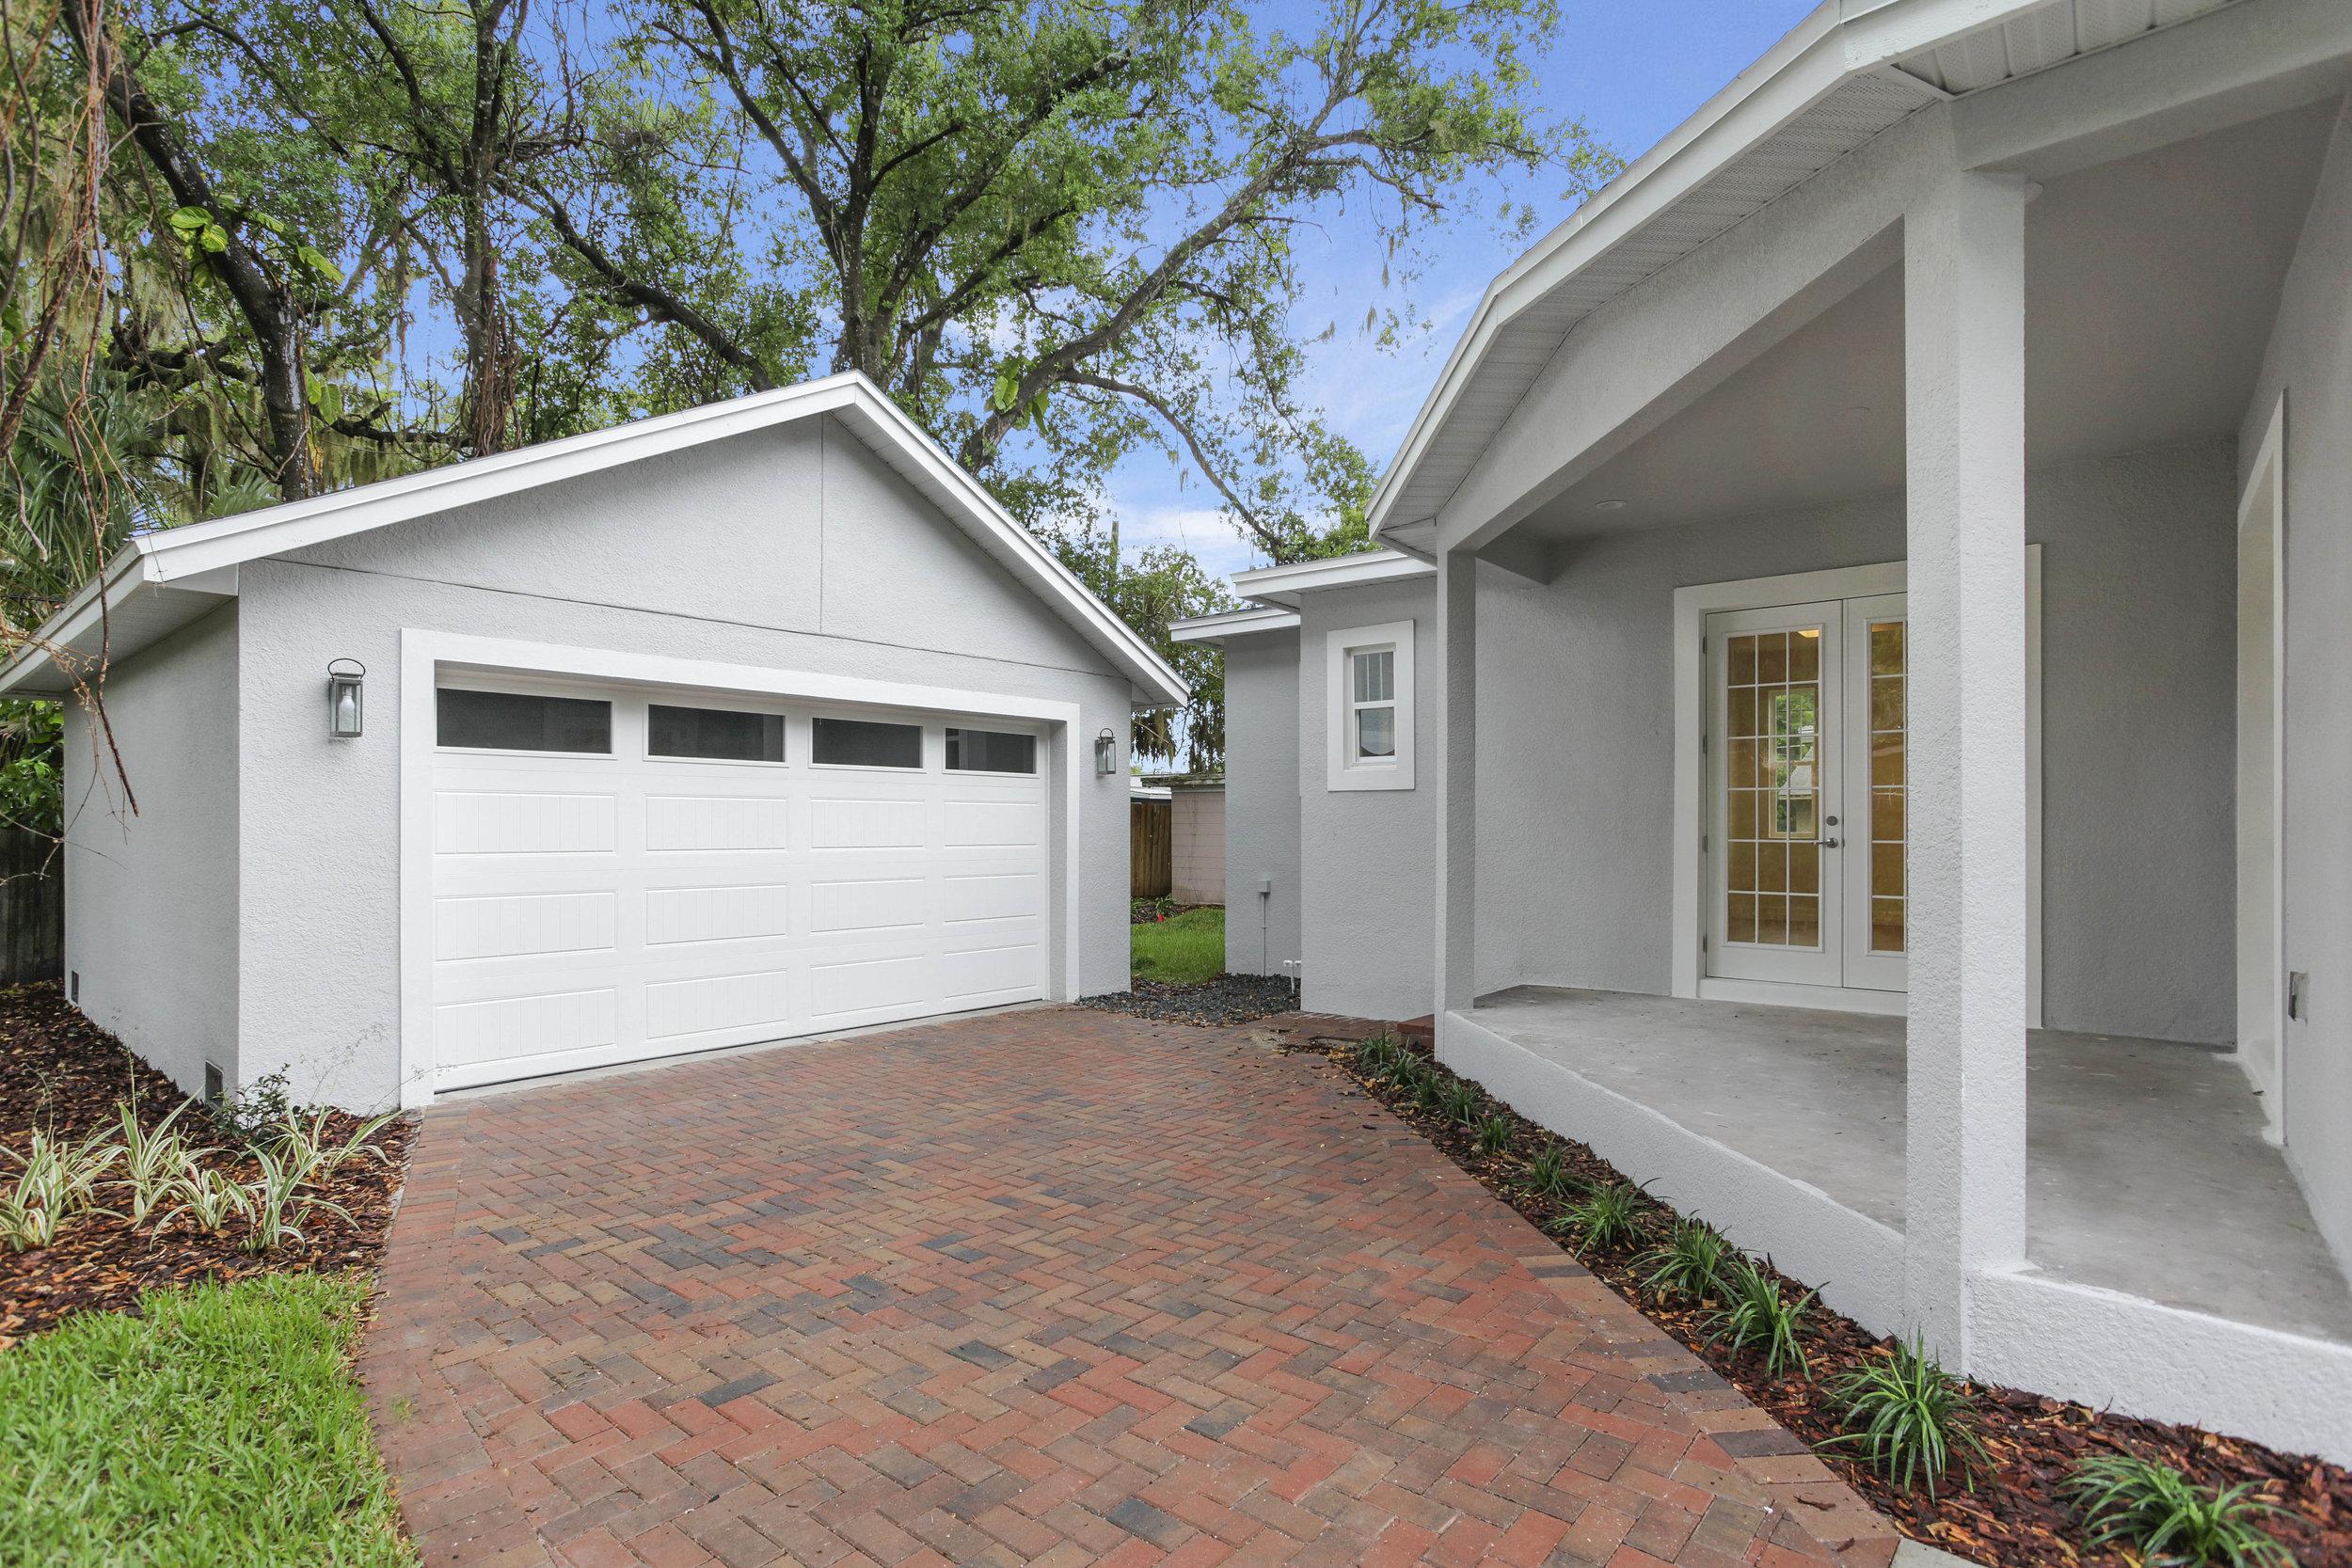 317 S Brown Ave, Orlando_IMG_0568.jpg